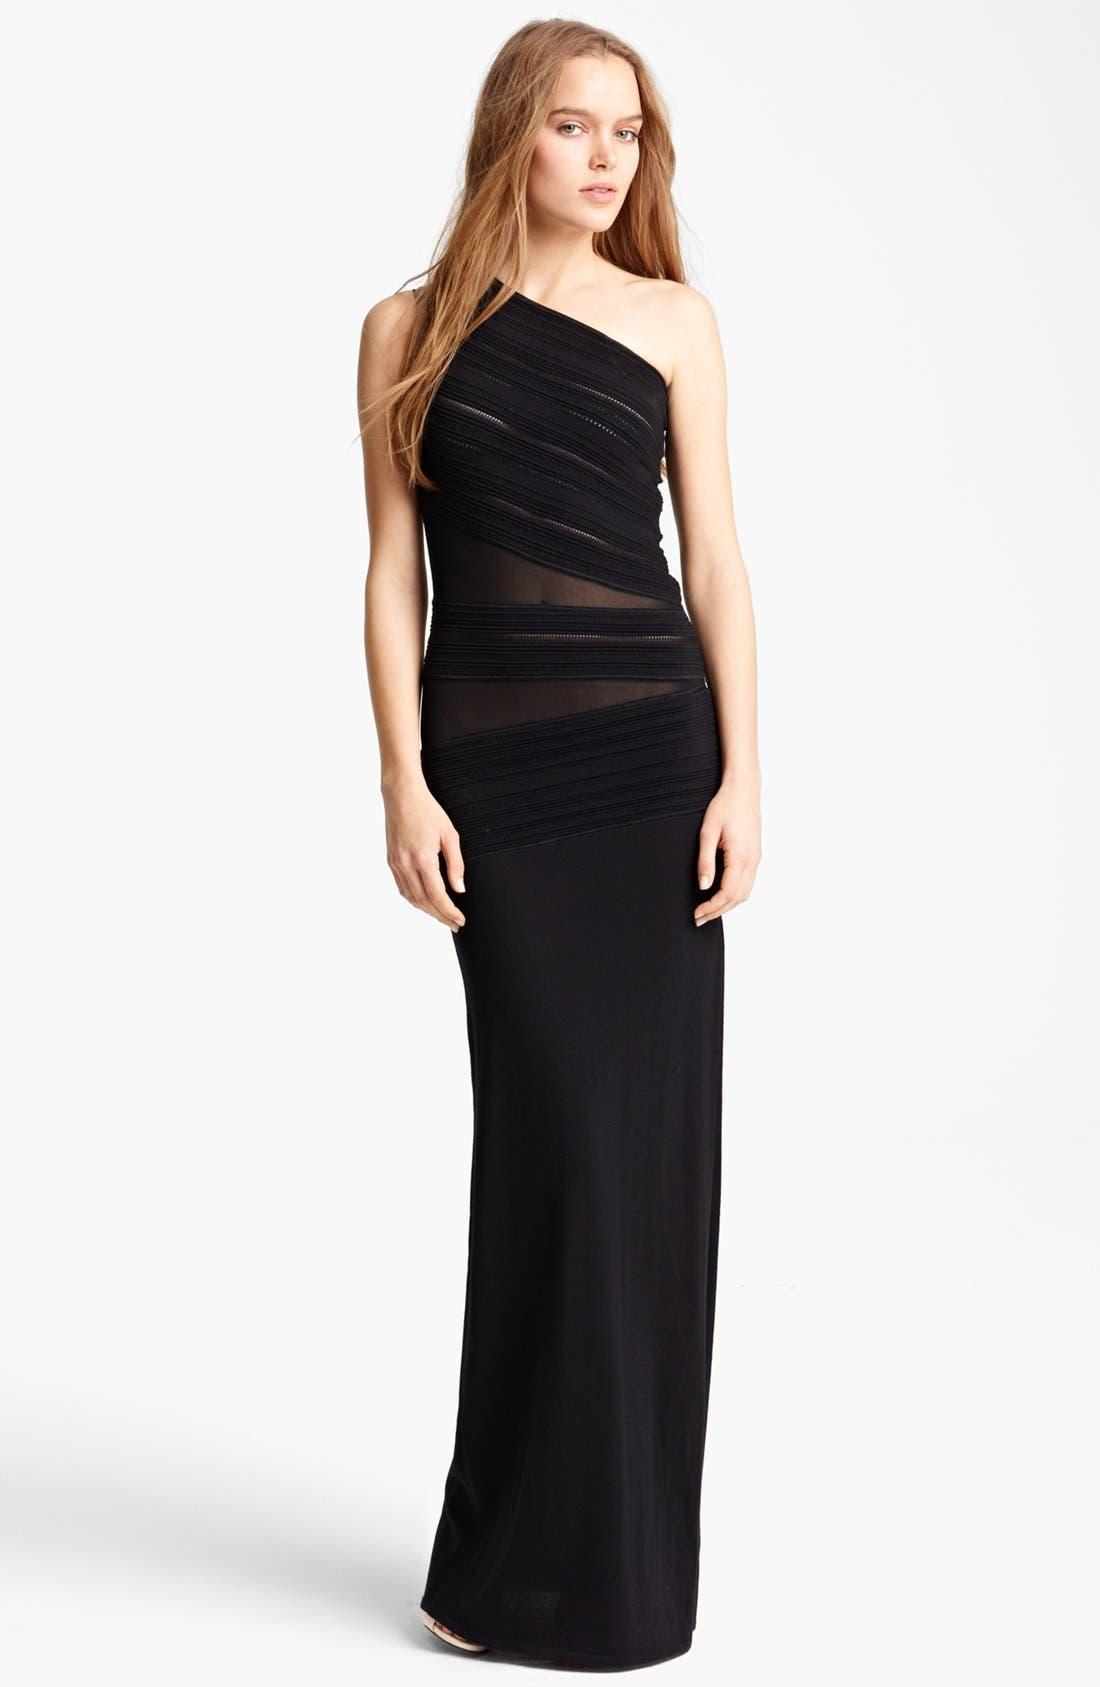 Alternate Image 1 Selected - Roberto Cavalli Sheer Inset One Shoulder Gown